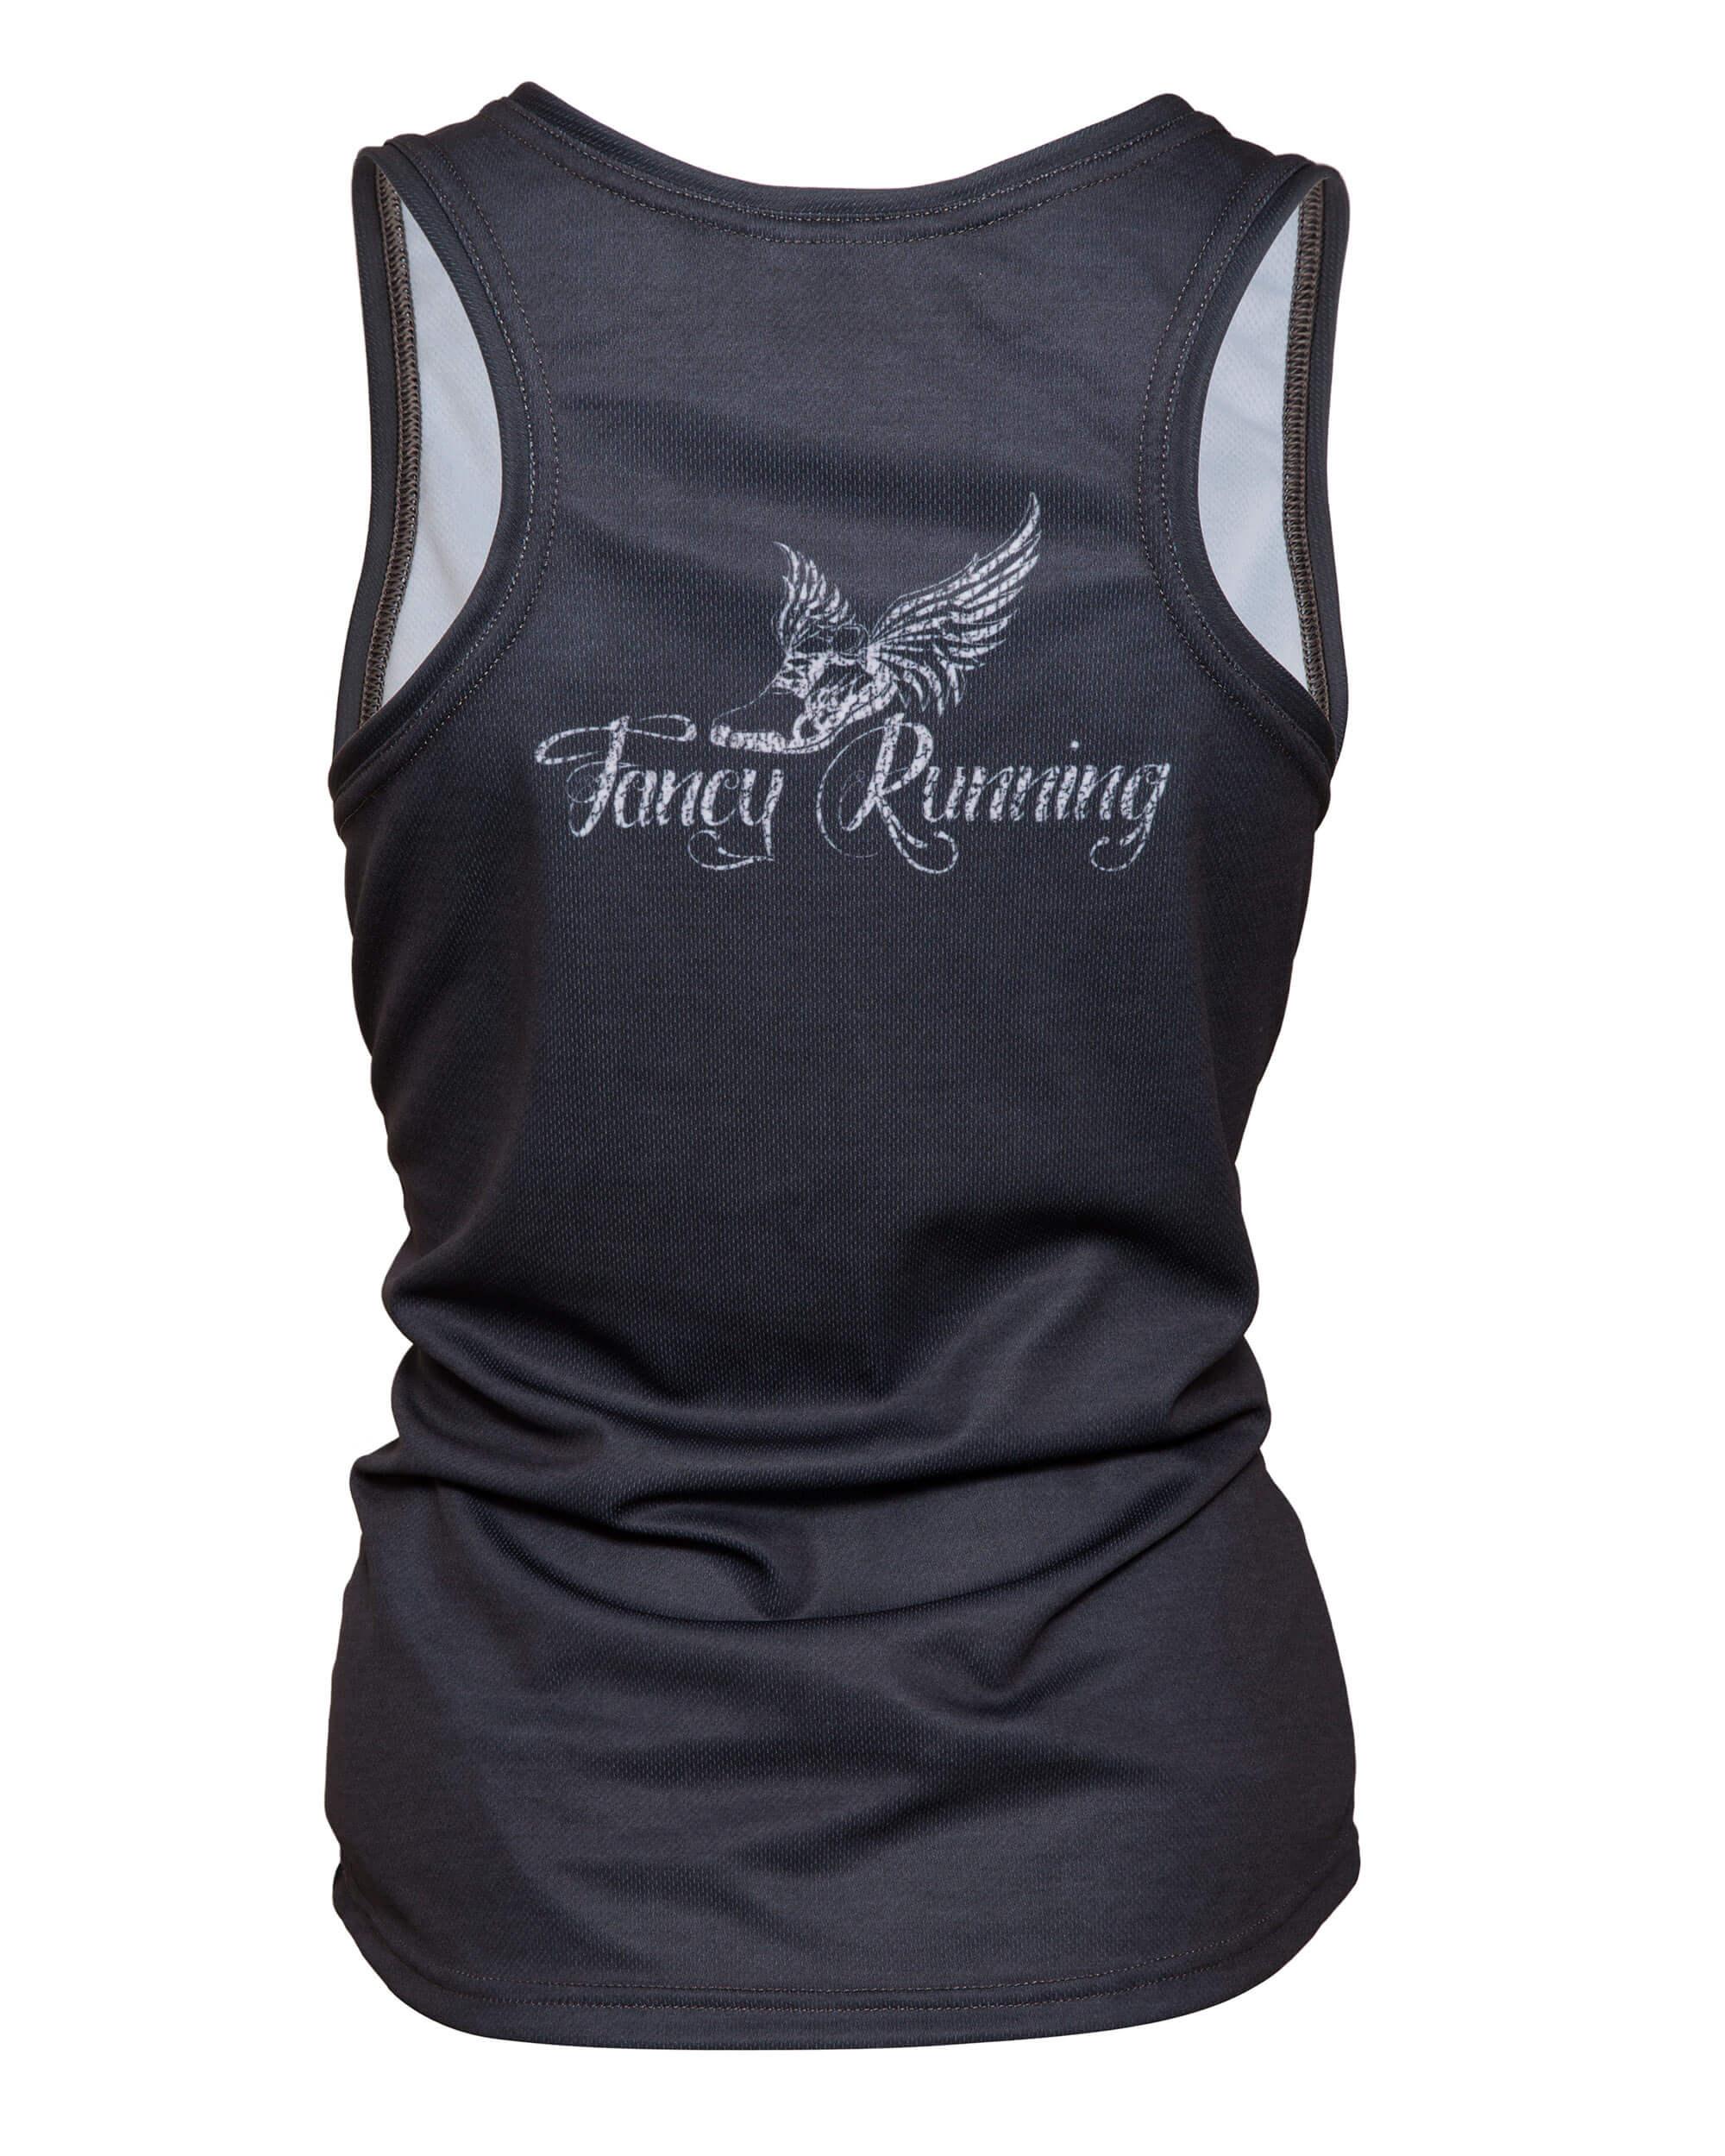 bbb3a2b48f35 ... Fancy Running - Vintage Band T Running Vest - Womens